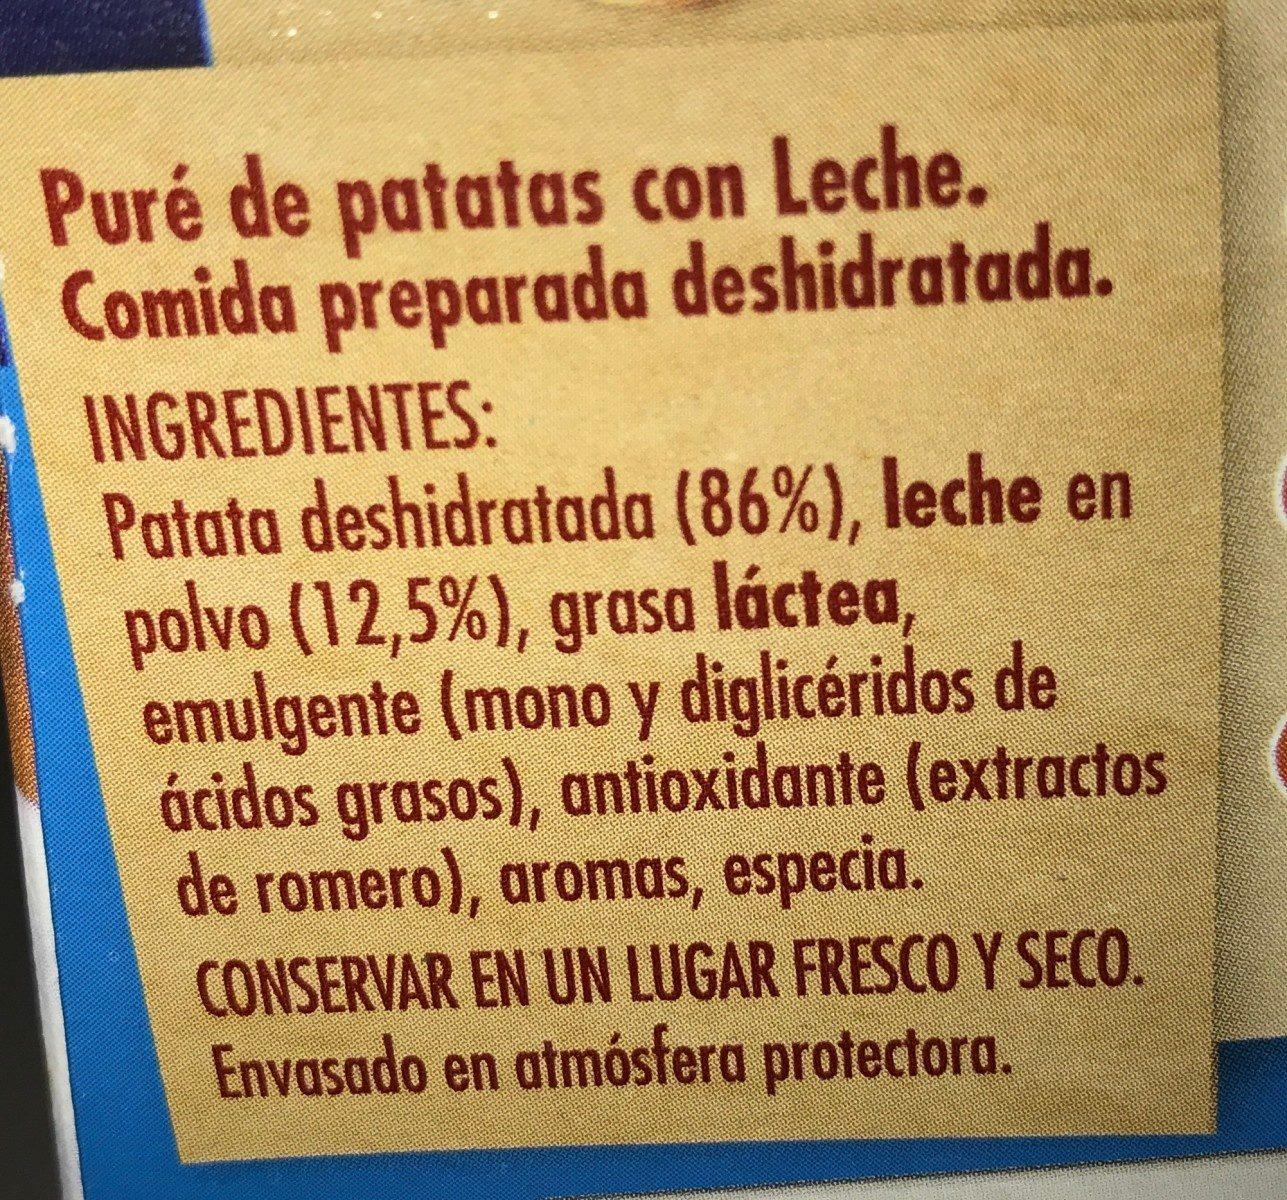 Puré de patata con leche sin gluten estuche 230 g - Ingredientes - fr